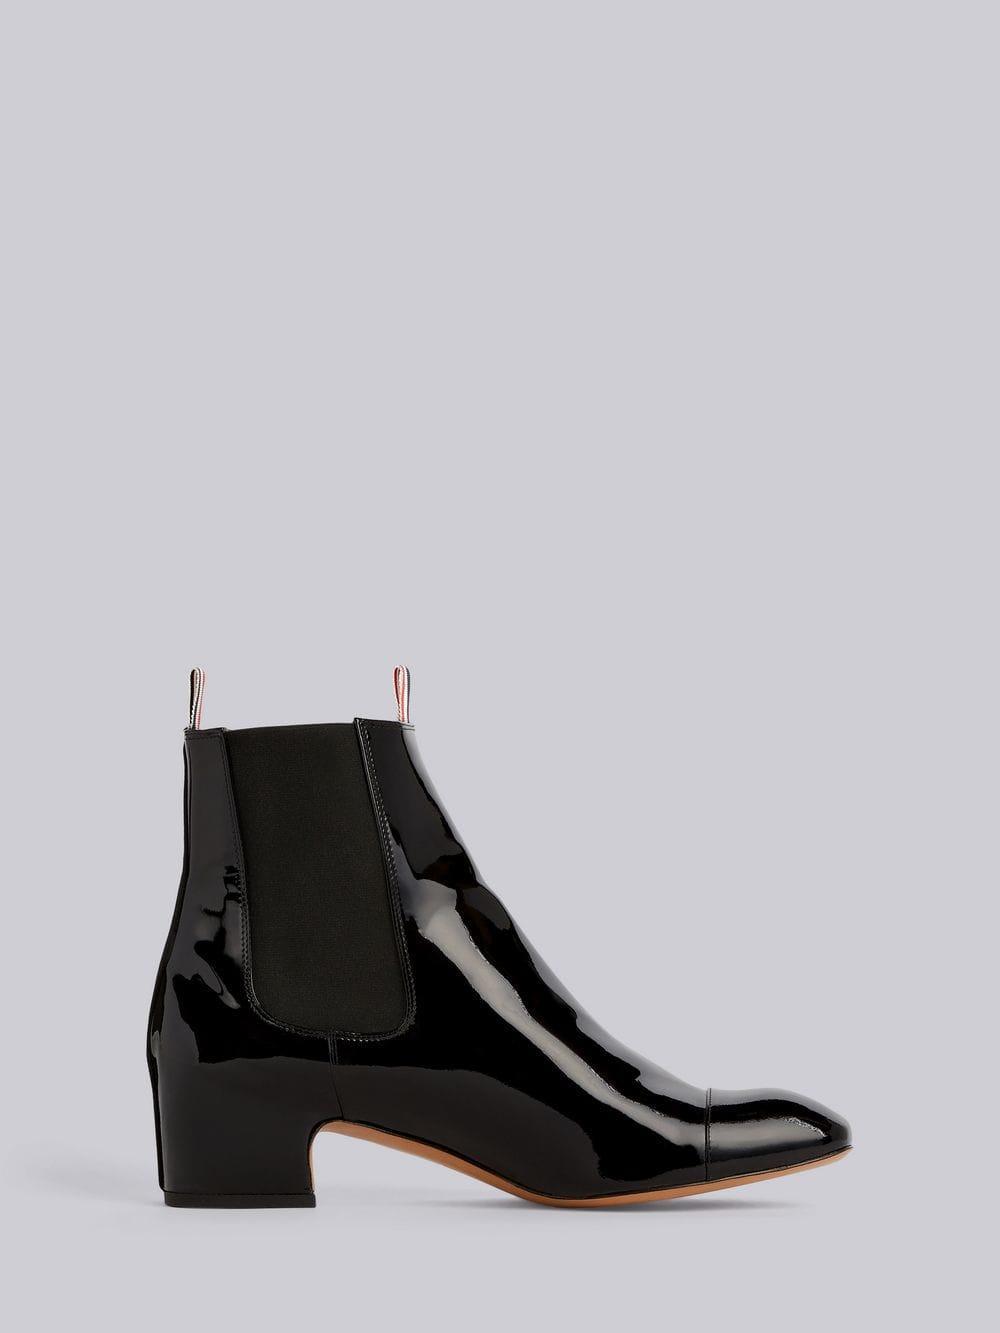 a3f0dd9eaed Women's Black Block Heel Patent Leather Chelsea Boot